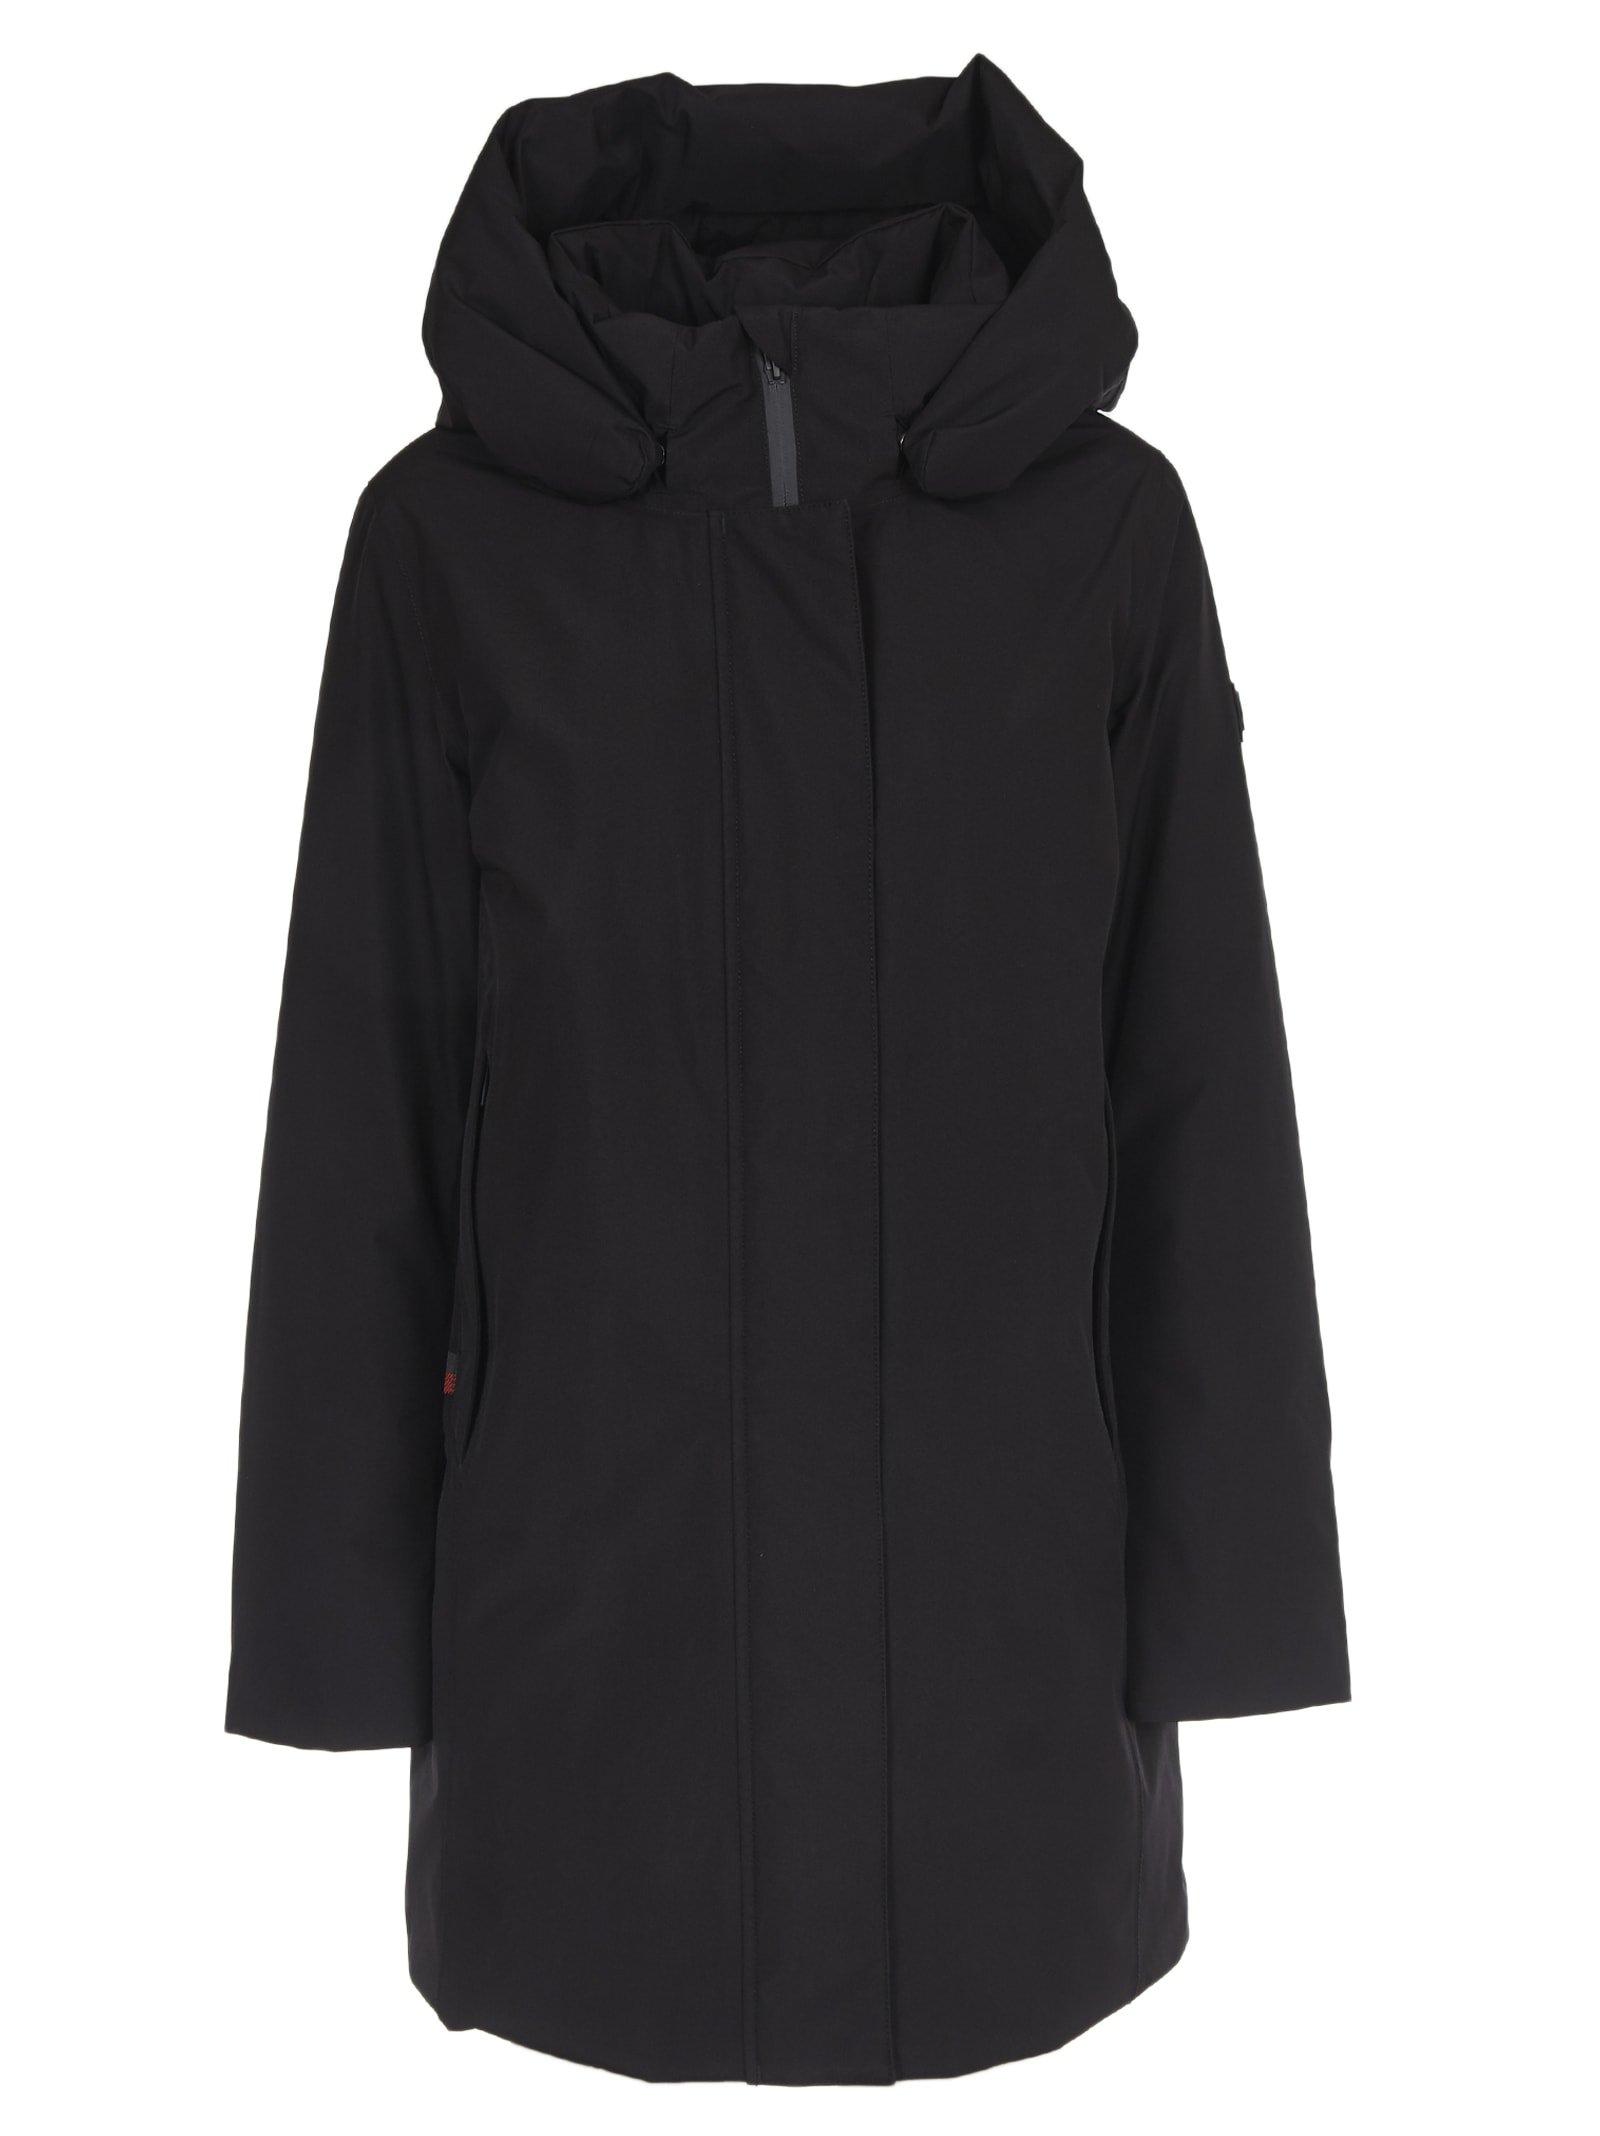 Woolrich Black Marshall Coat